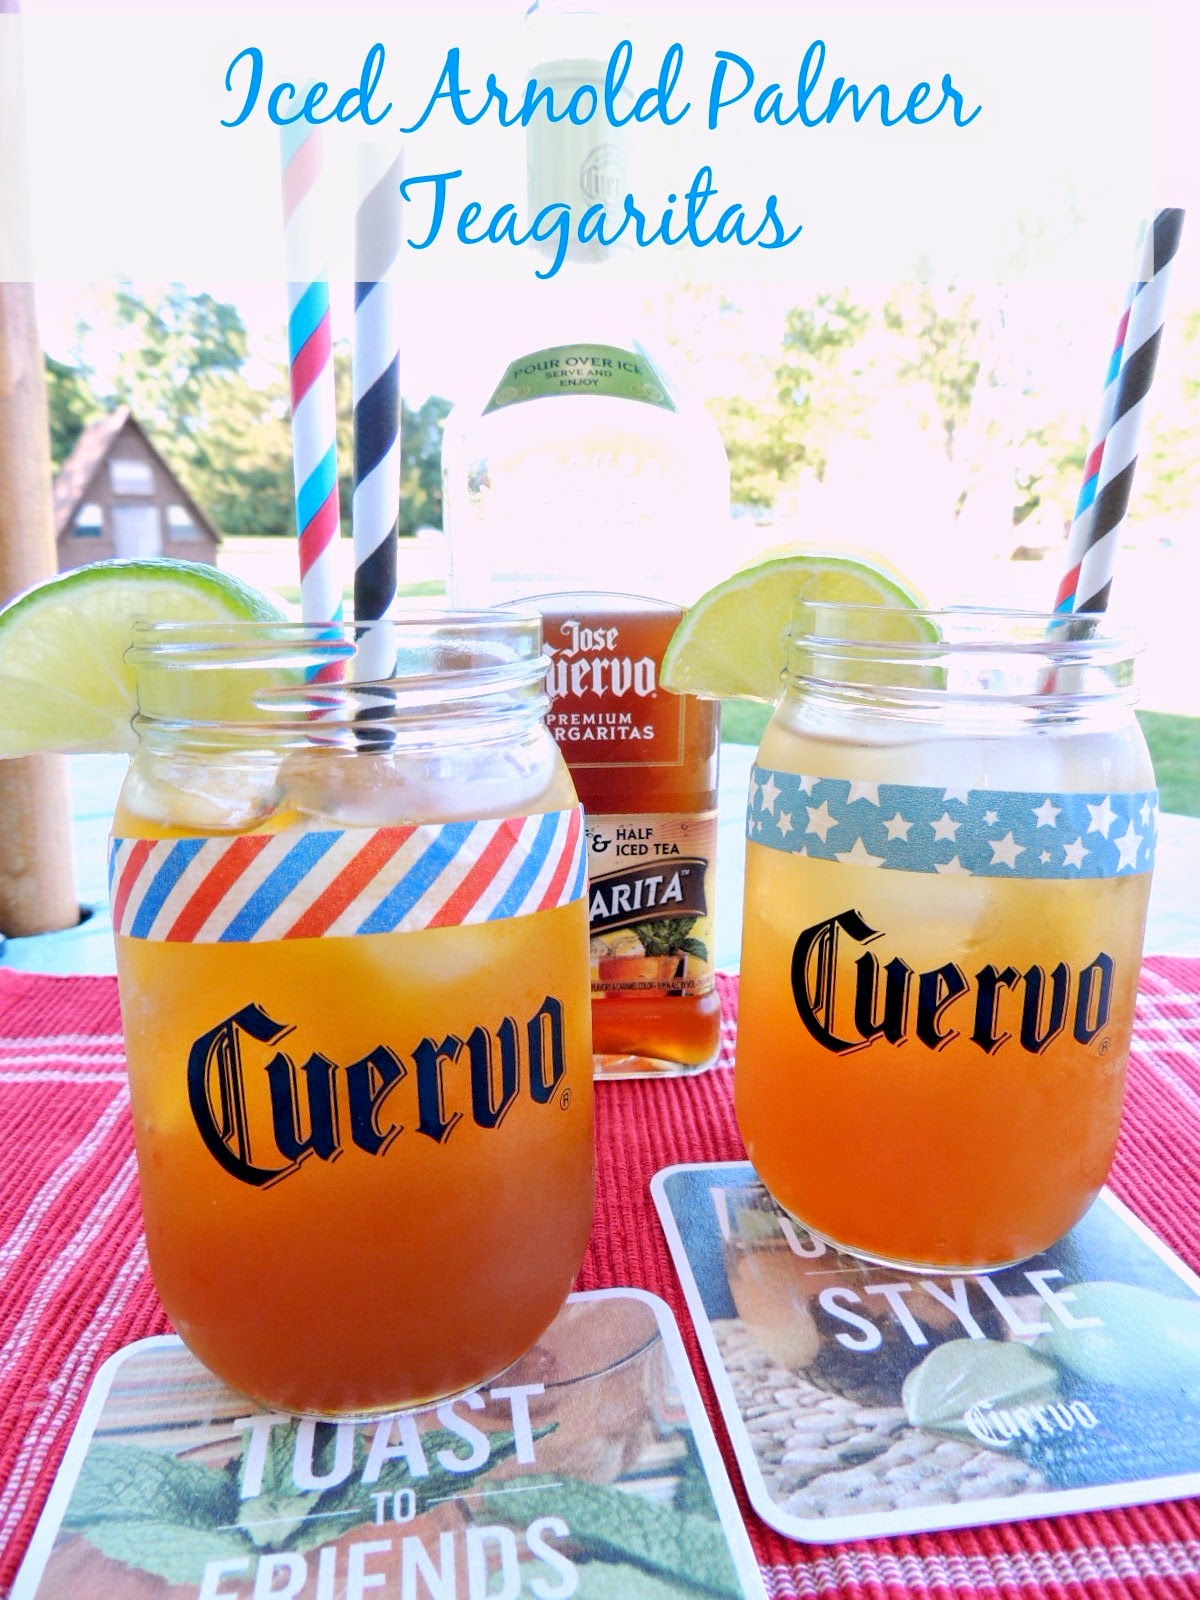 Iced Arnold Palmer Teagaritas via thefrugalfoodiemama.com #CuervoTeagarita #cocktail